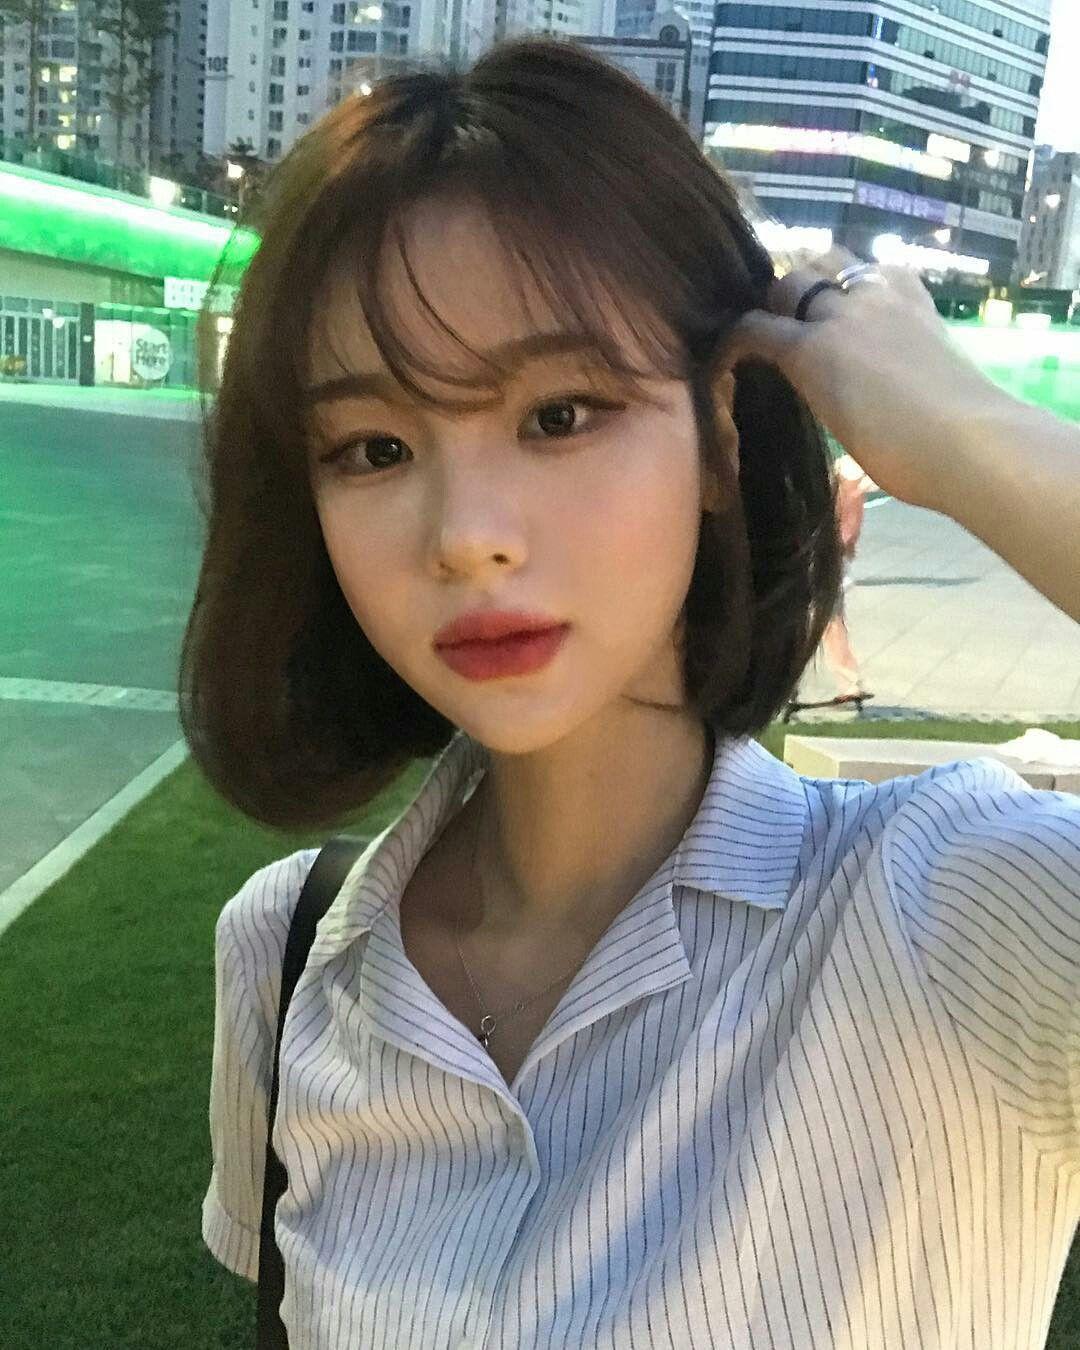 Pin By Arroyani Annisa On Klookz Asian Short Hair Short Hair With Bangs Korean Short Hair Bangs